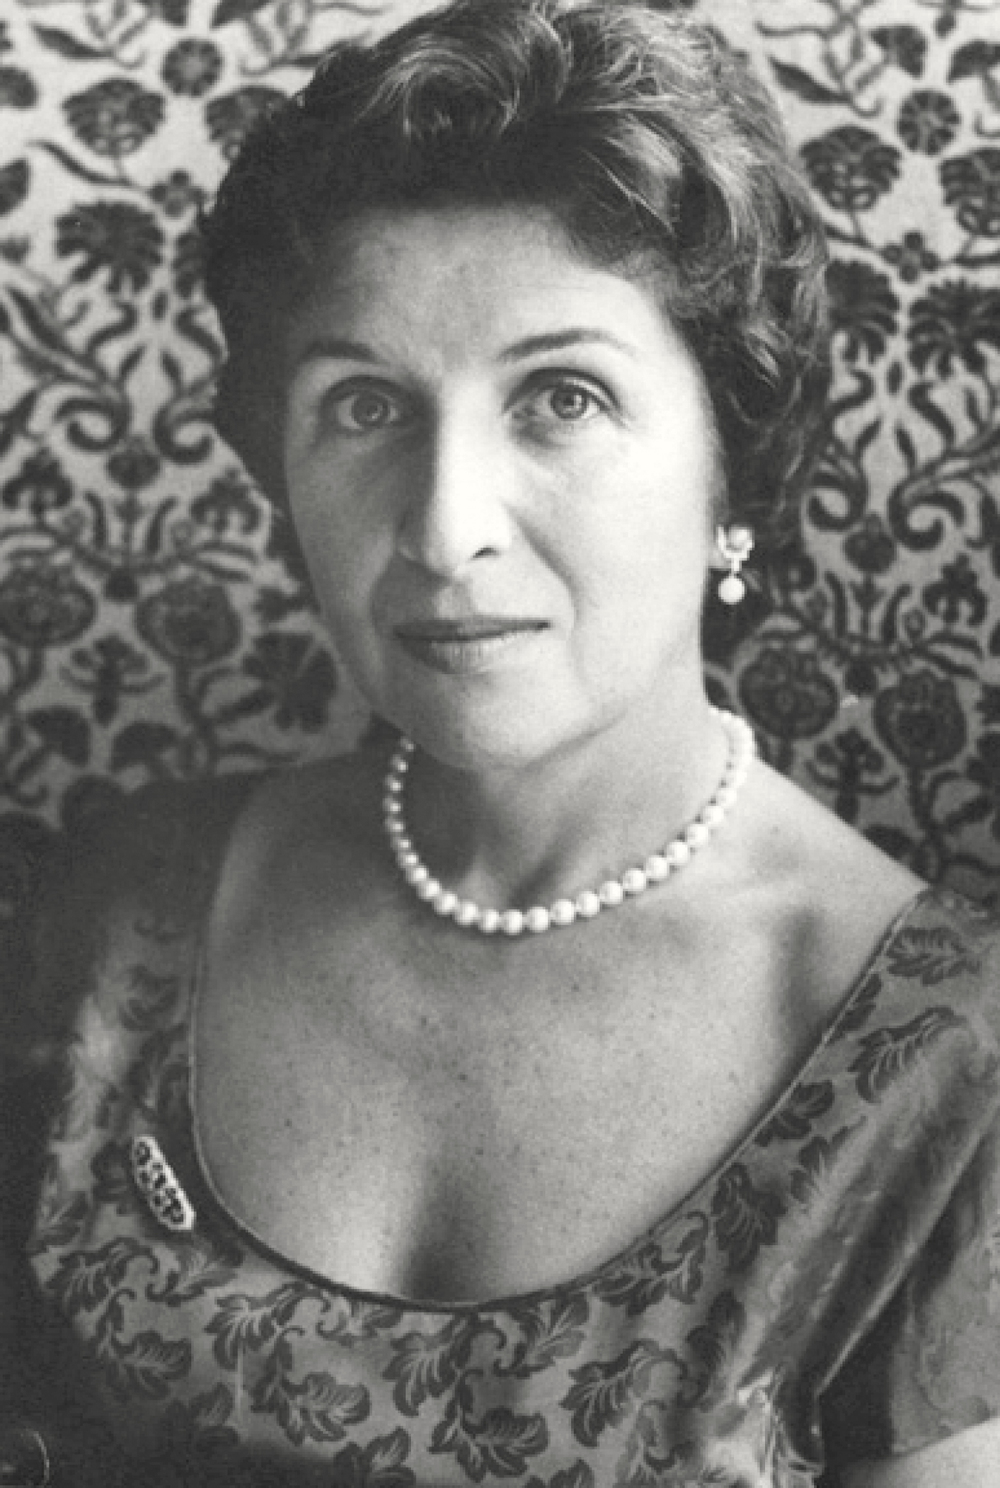 Esther Sternberg, 1959